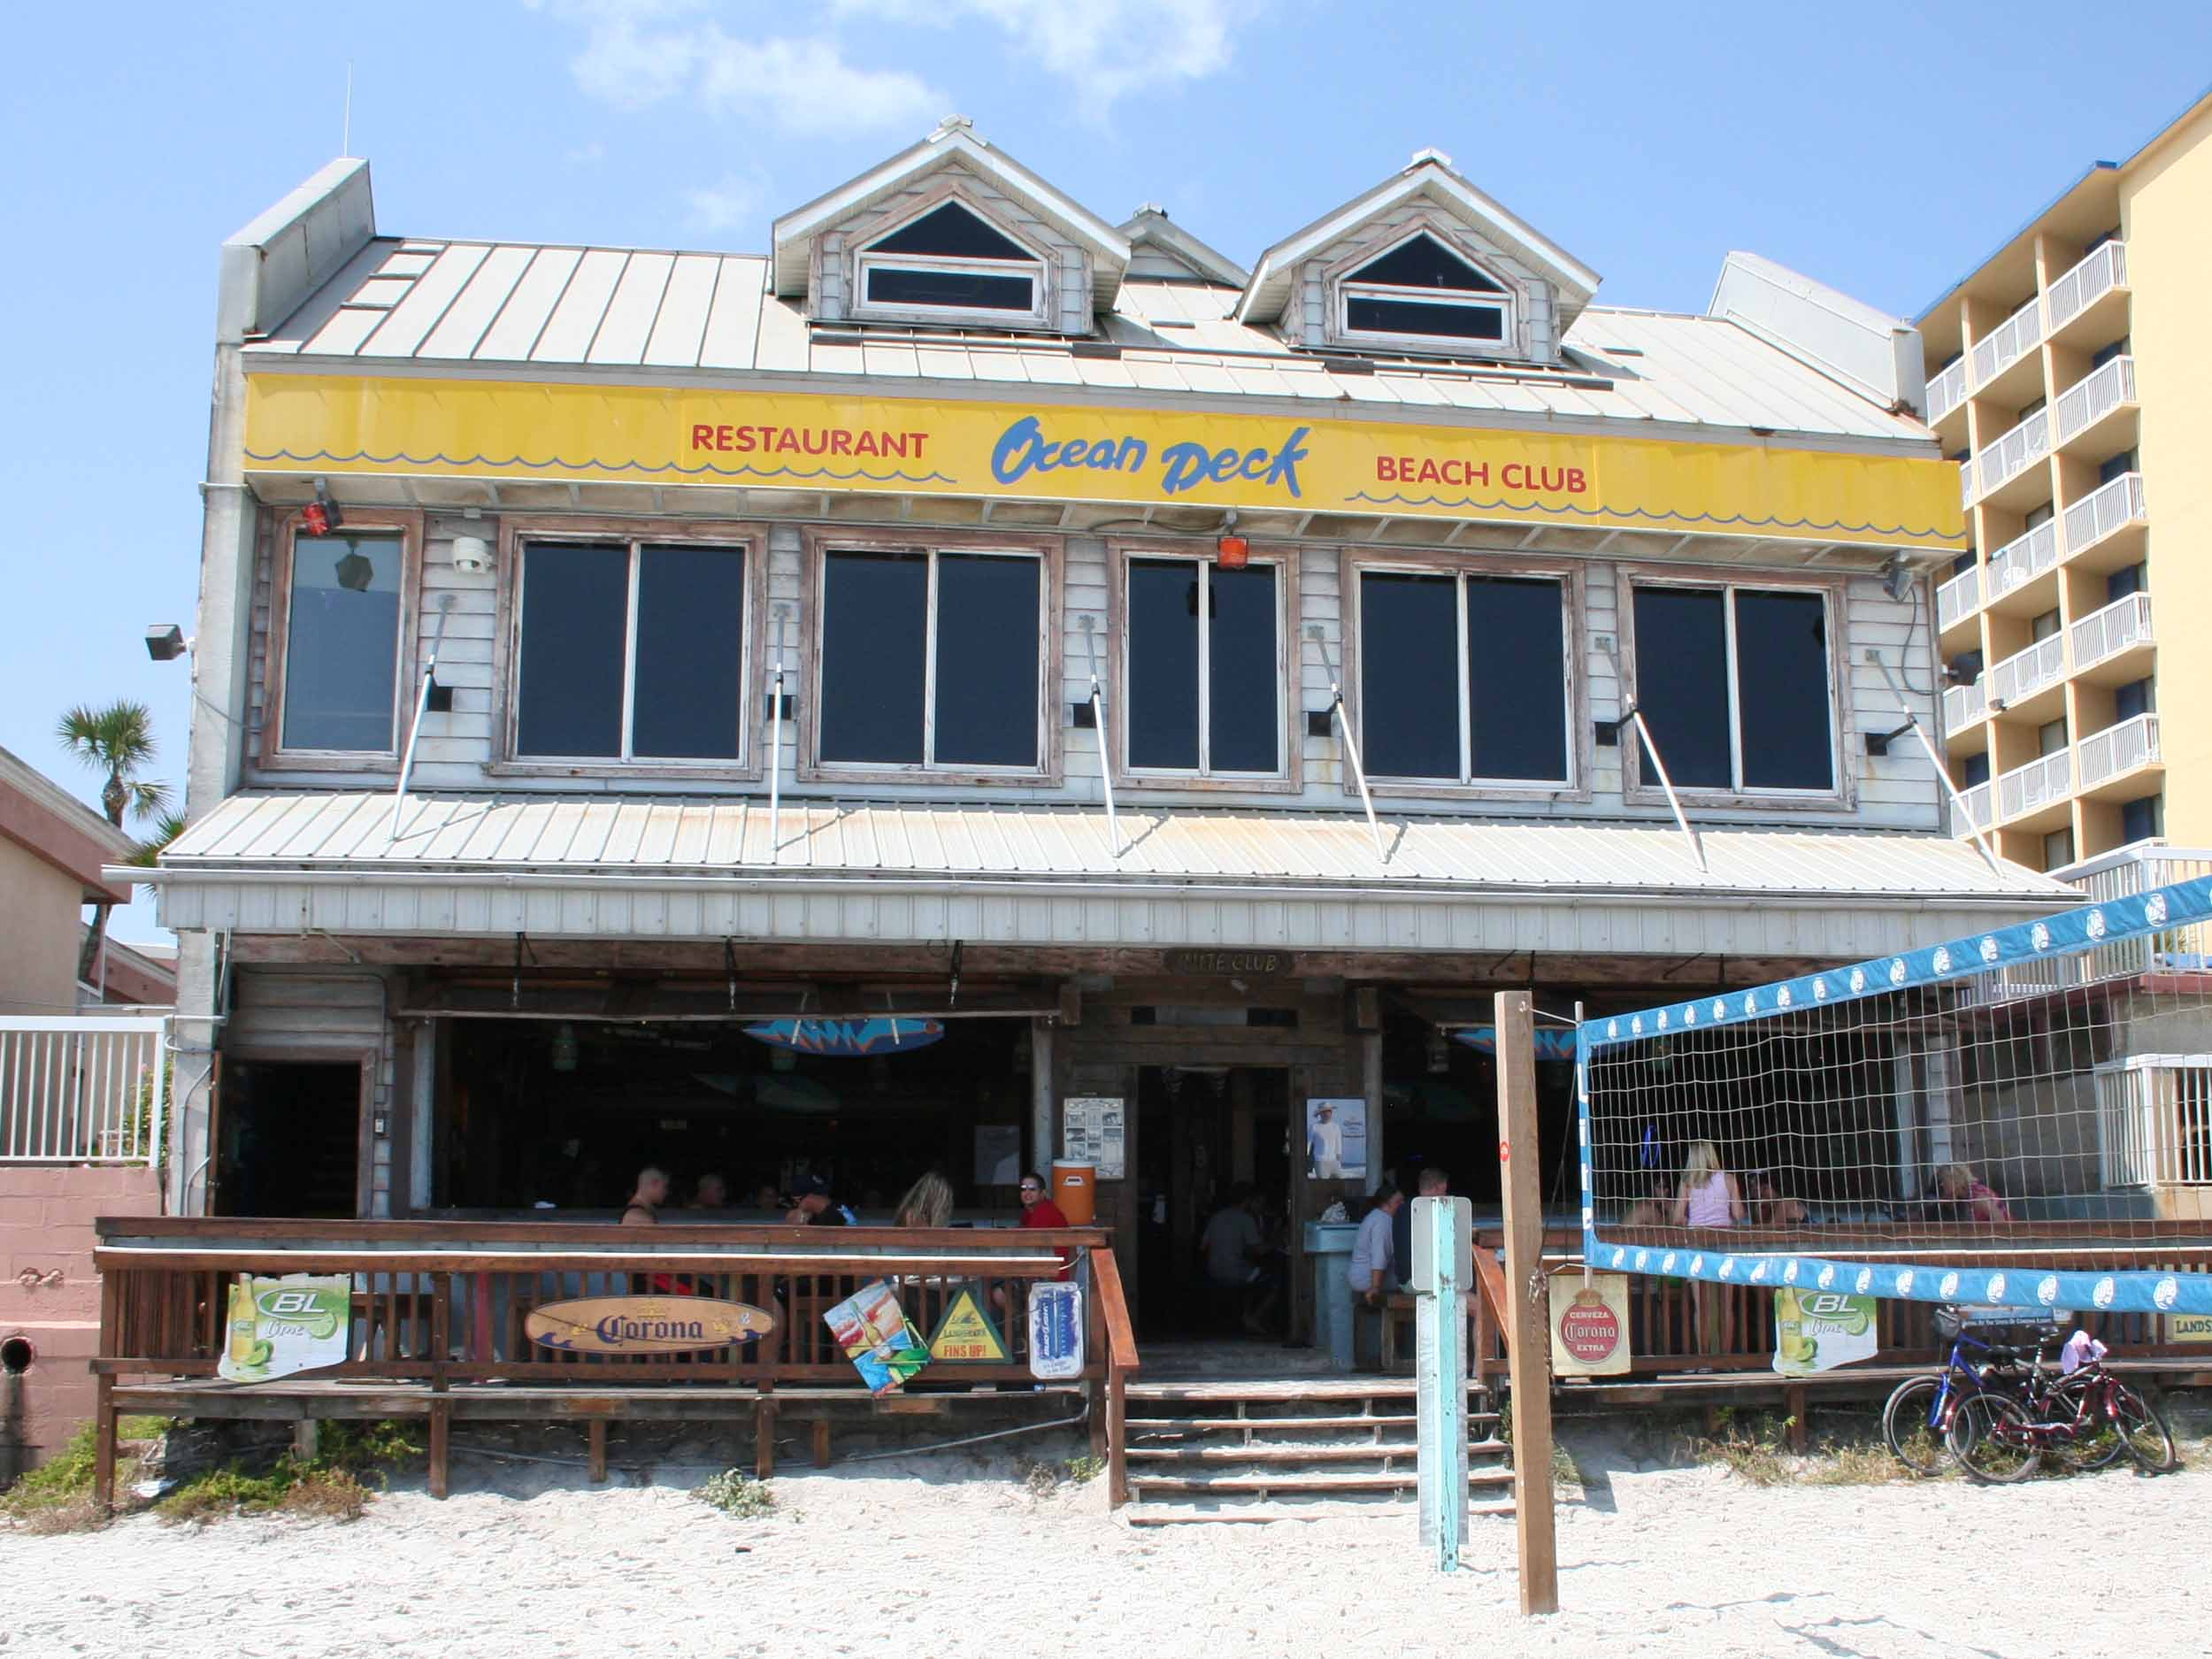 Ocean Deck Restaurant and Beach Club Exterior